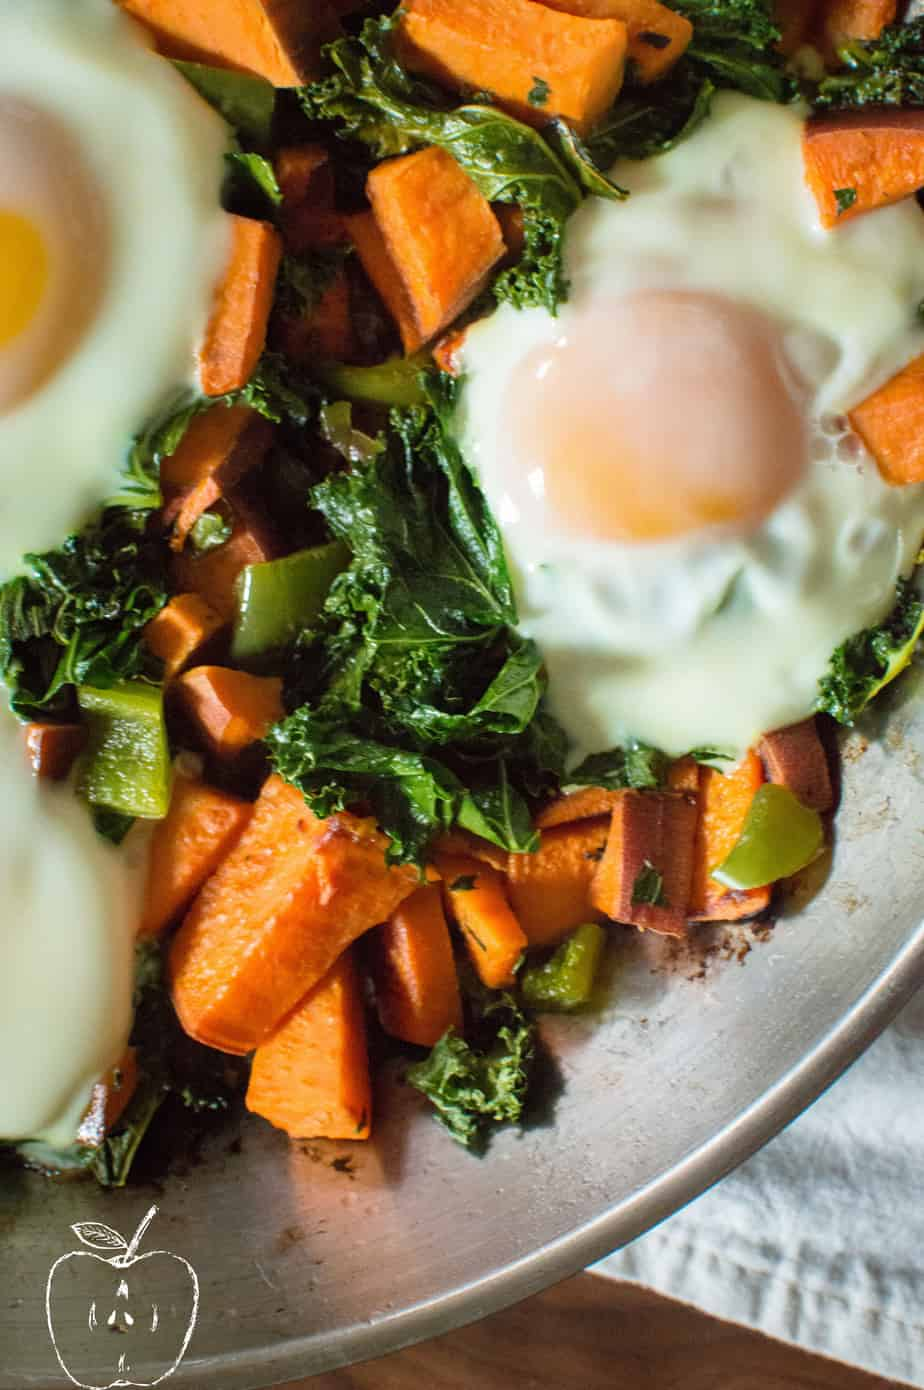 Closeup on One-Skillet Sweet Potato & Kale Fries prepared with fresh Eggs